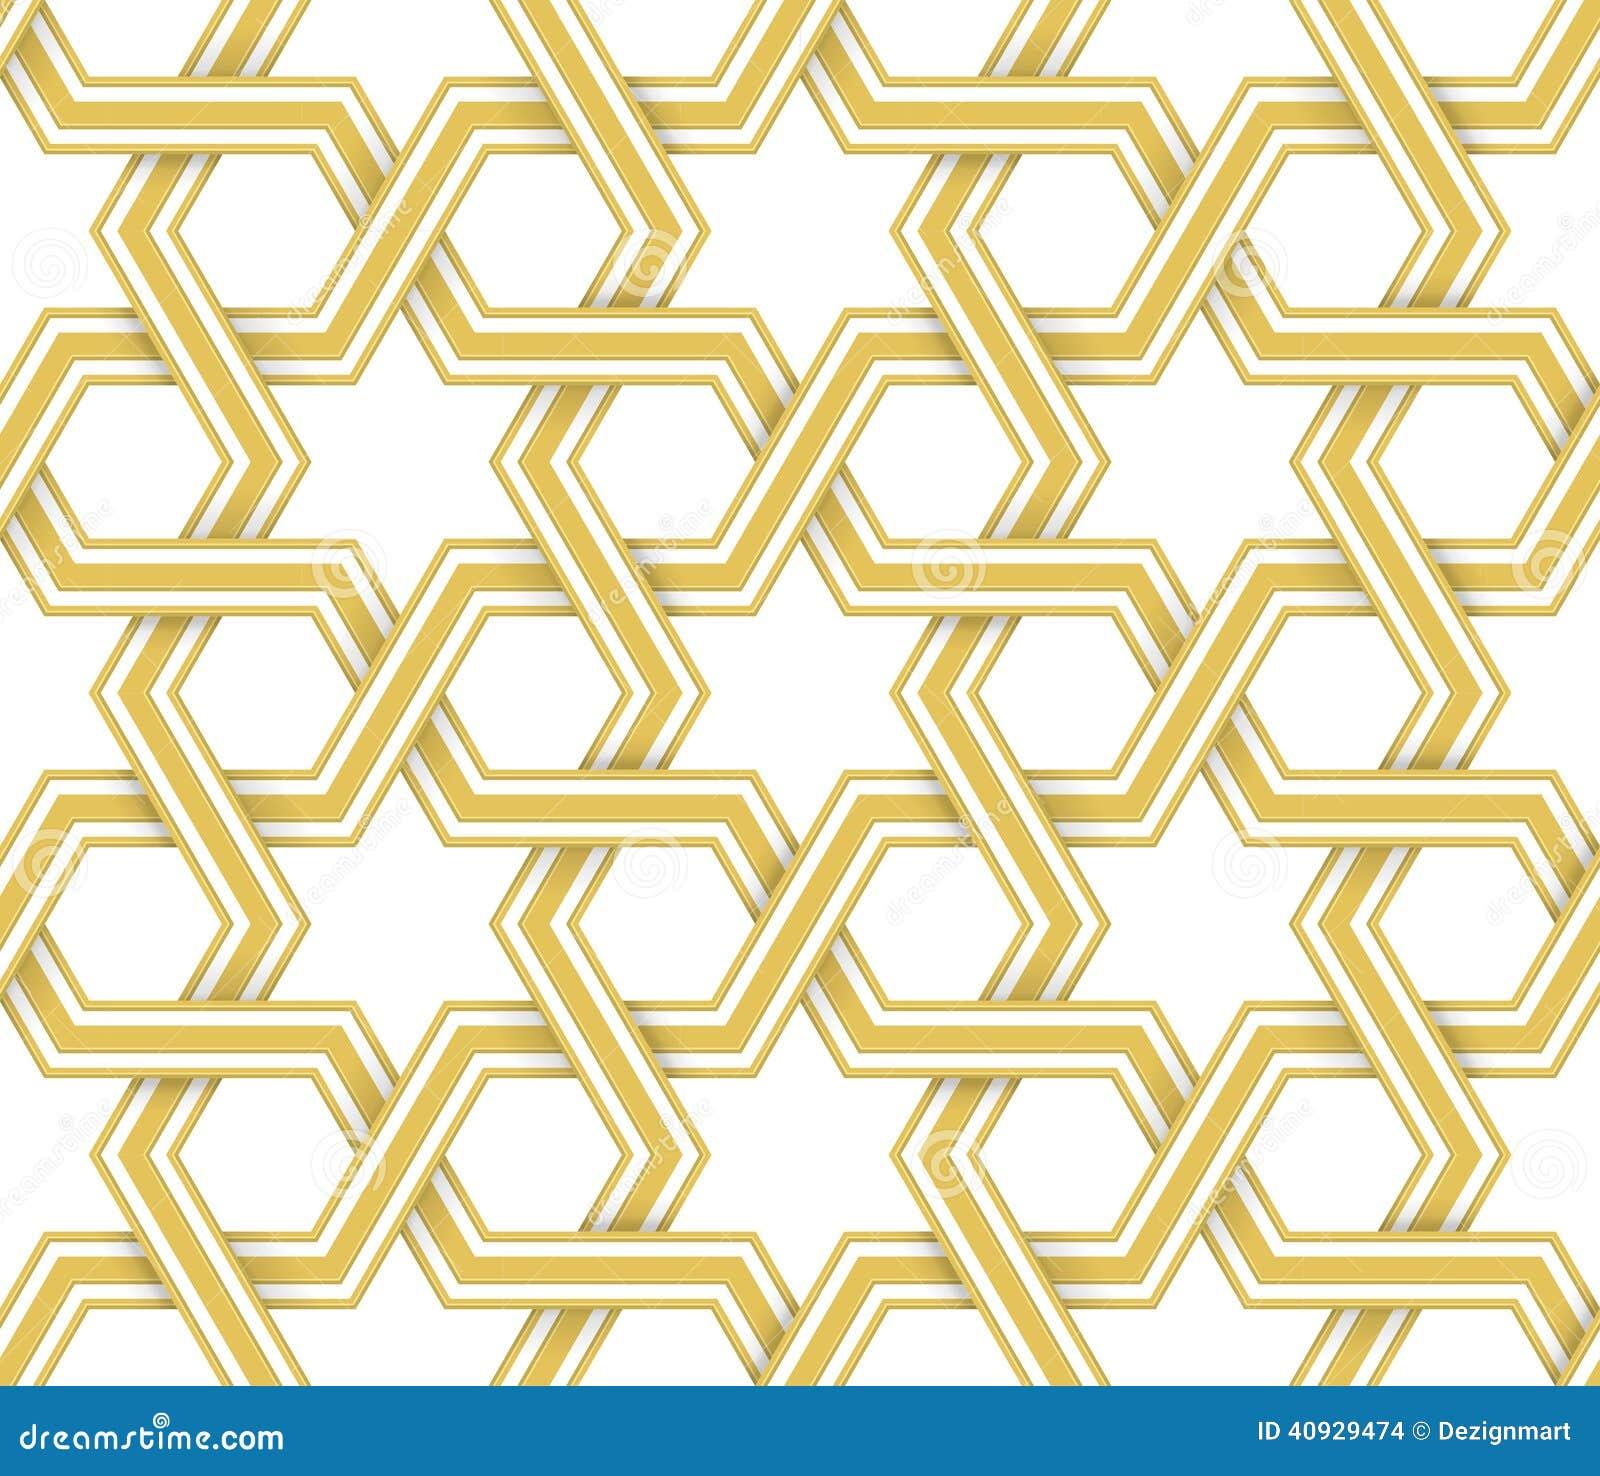 Unduh 4800 Koleksi Background Geometric Hijau Gratis Terbaik